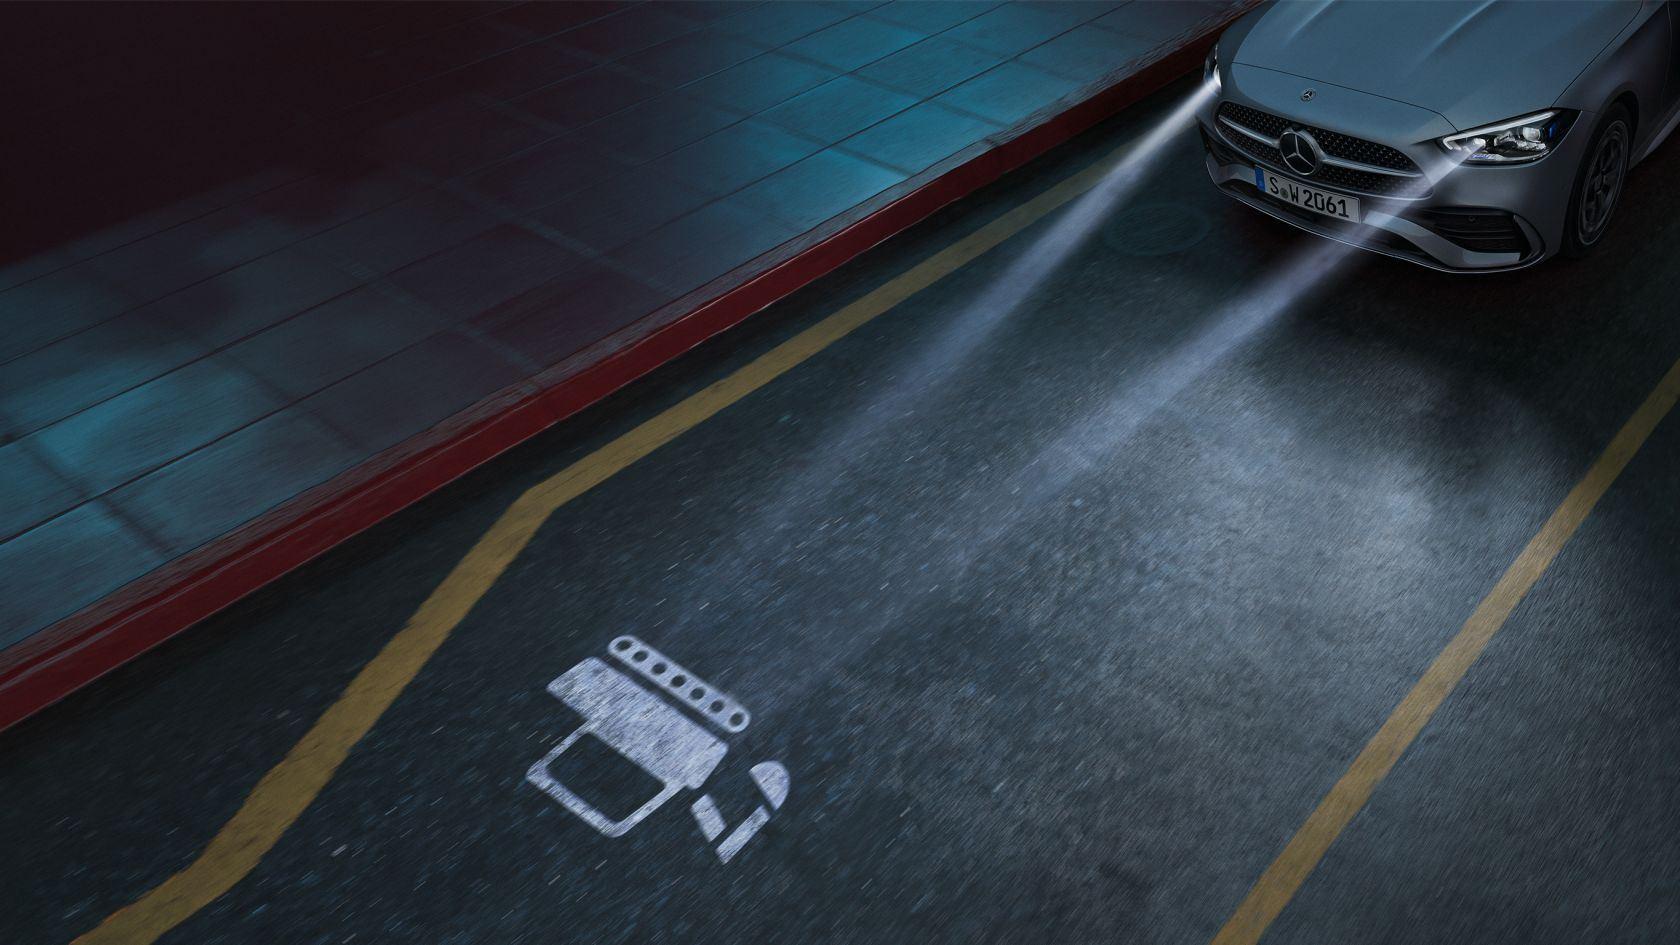 Mercedes C-Klasse Digital Light